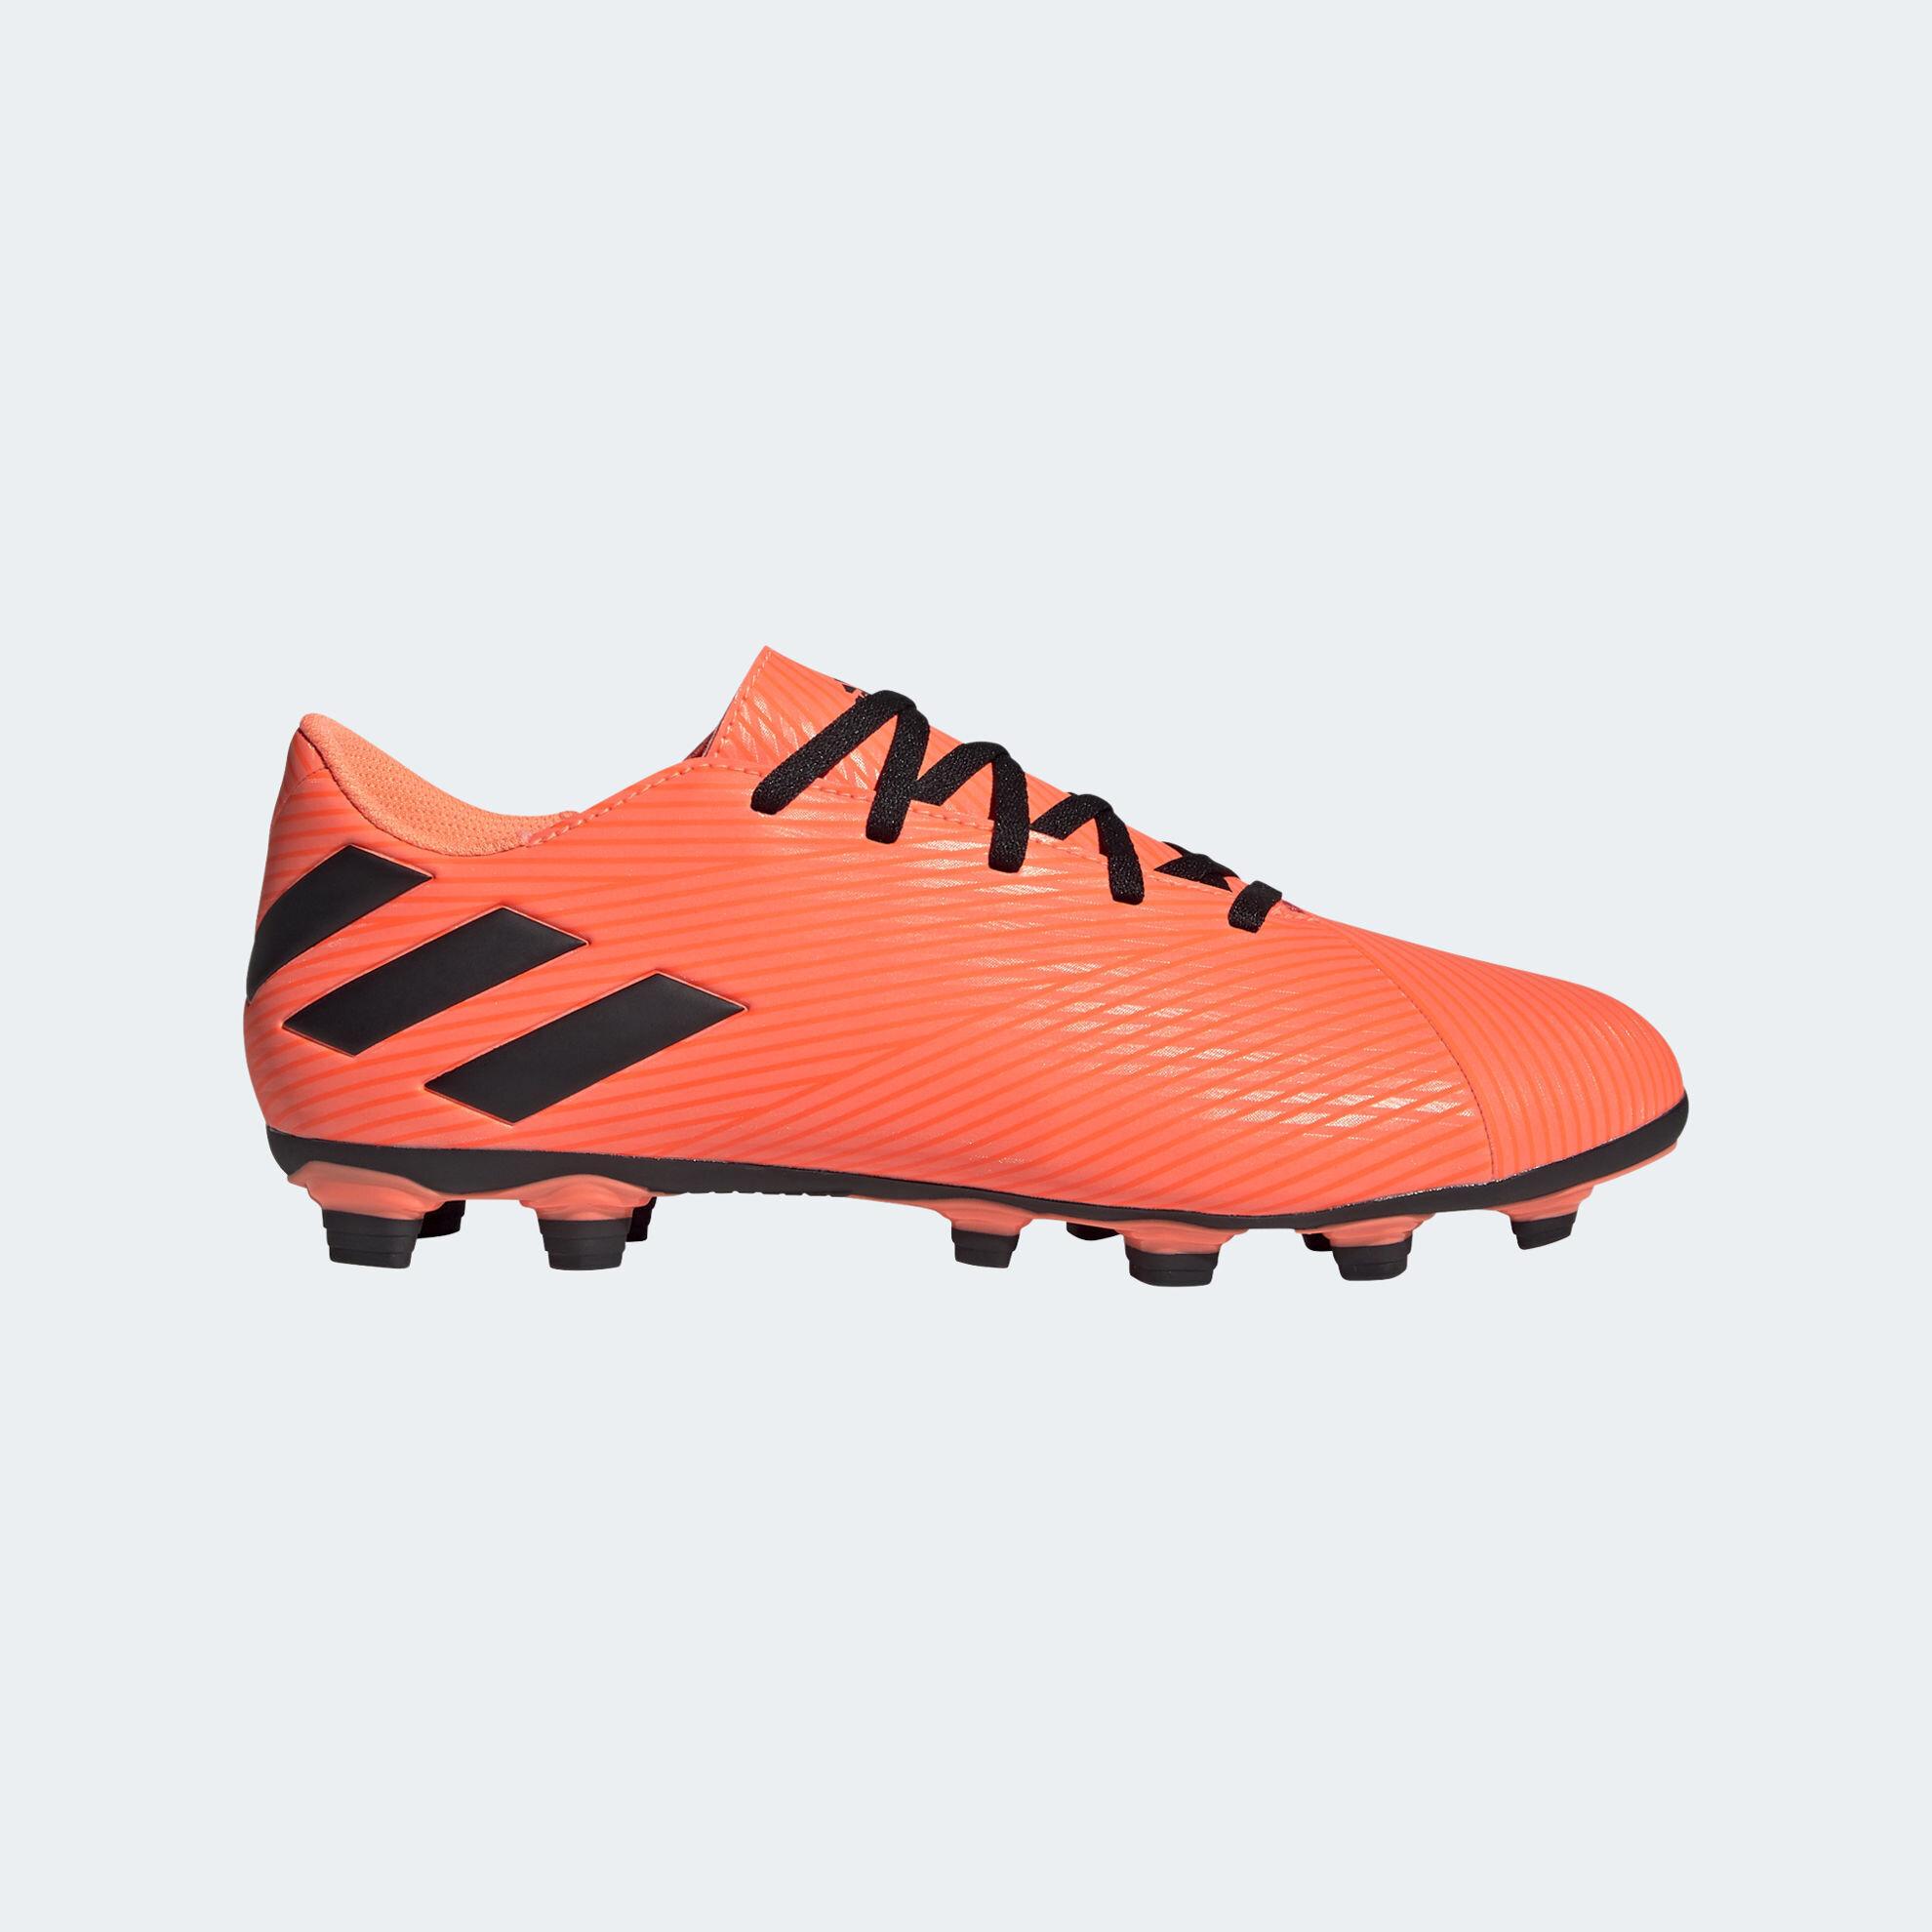 Adidas Nemeziz 19 4 Flexible Ground Boots Running Shoes Sportswear At Adidas Official Website Adidas Il